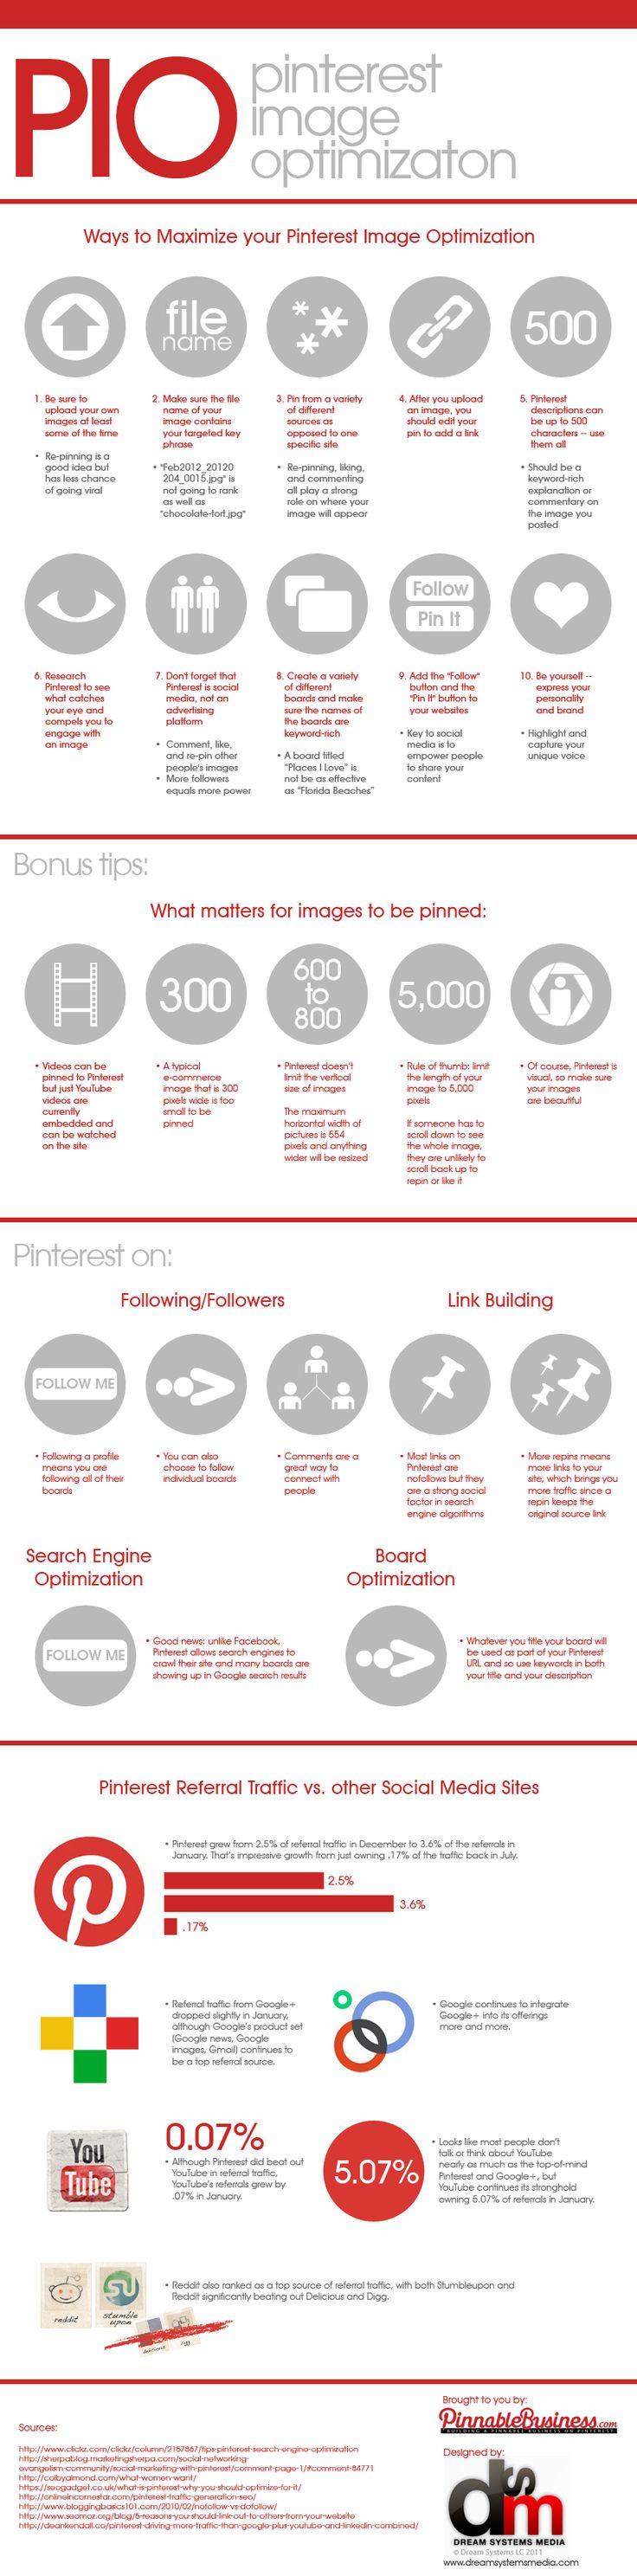 #Pinterest Optimization